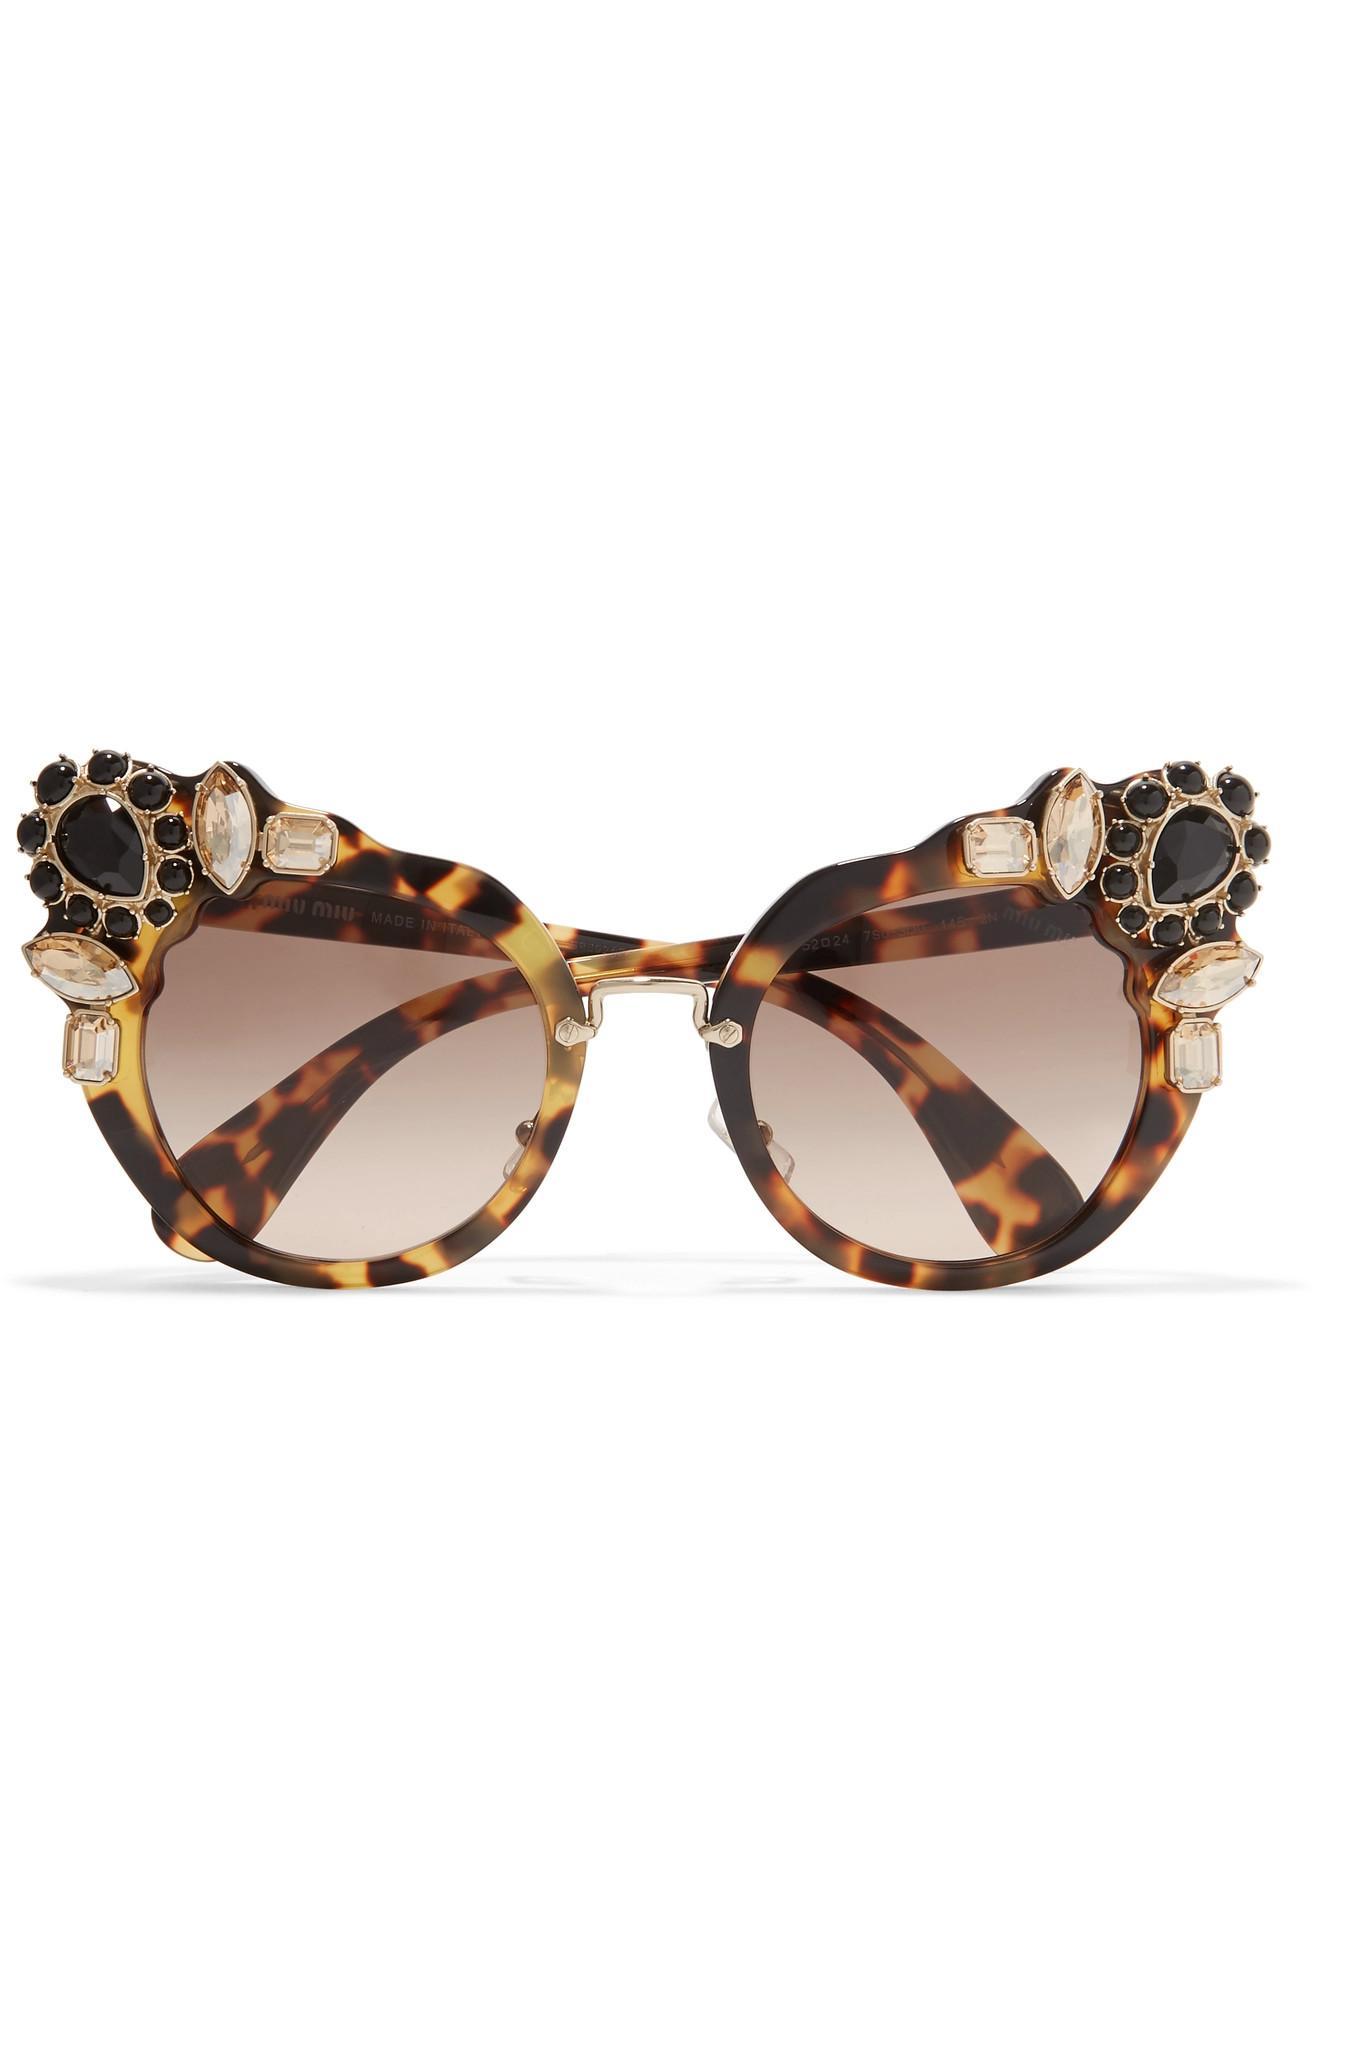 48dc7a8aa463 Fendi Crystal-embellished Cat-eye Acetate Sunglasses